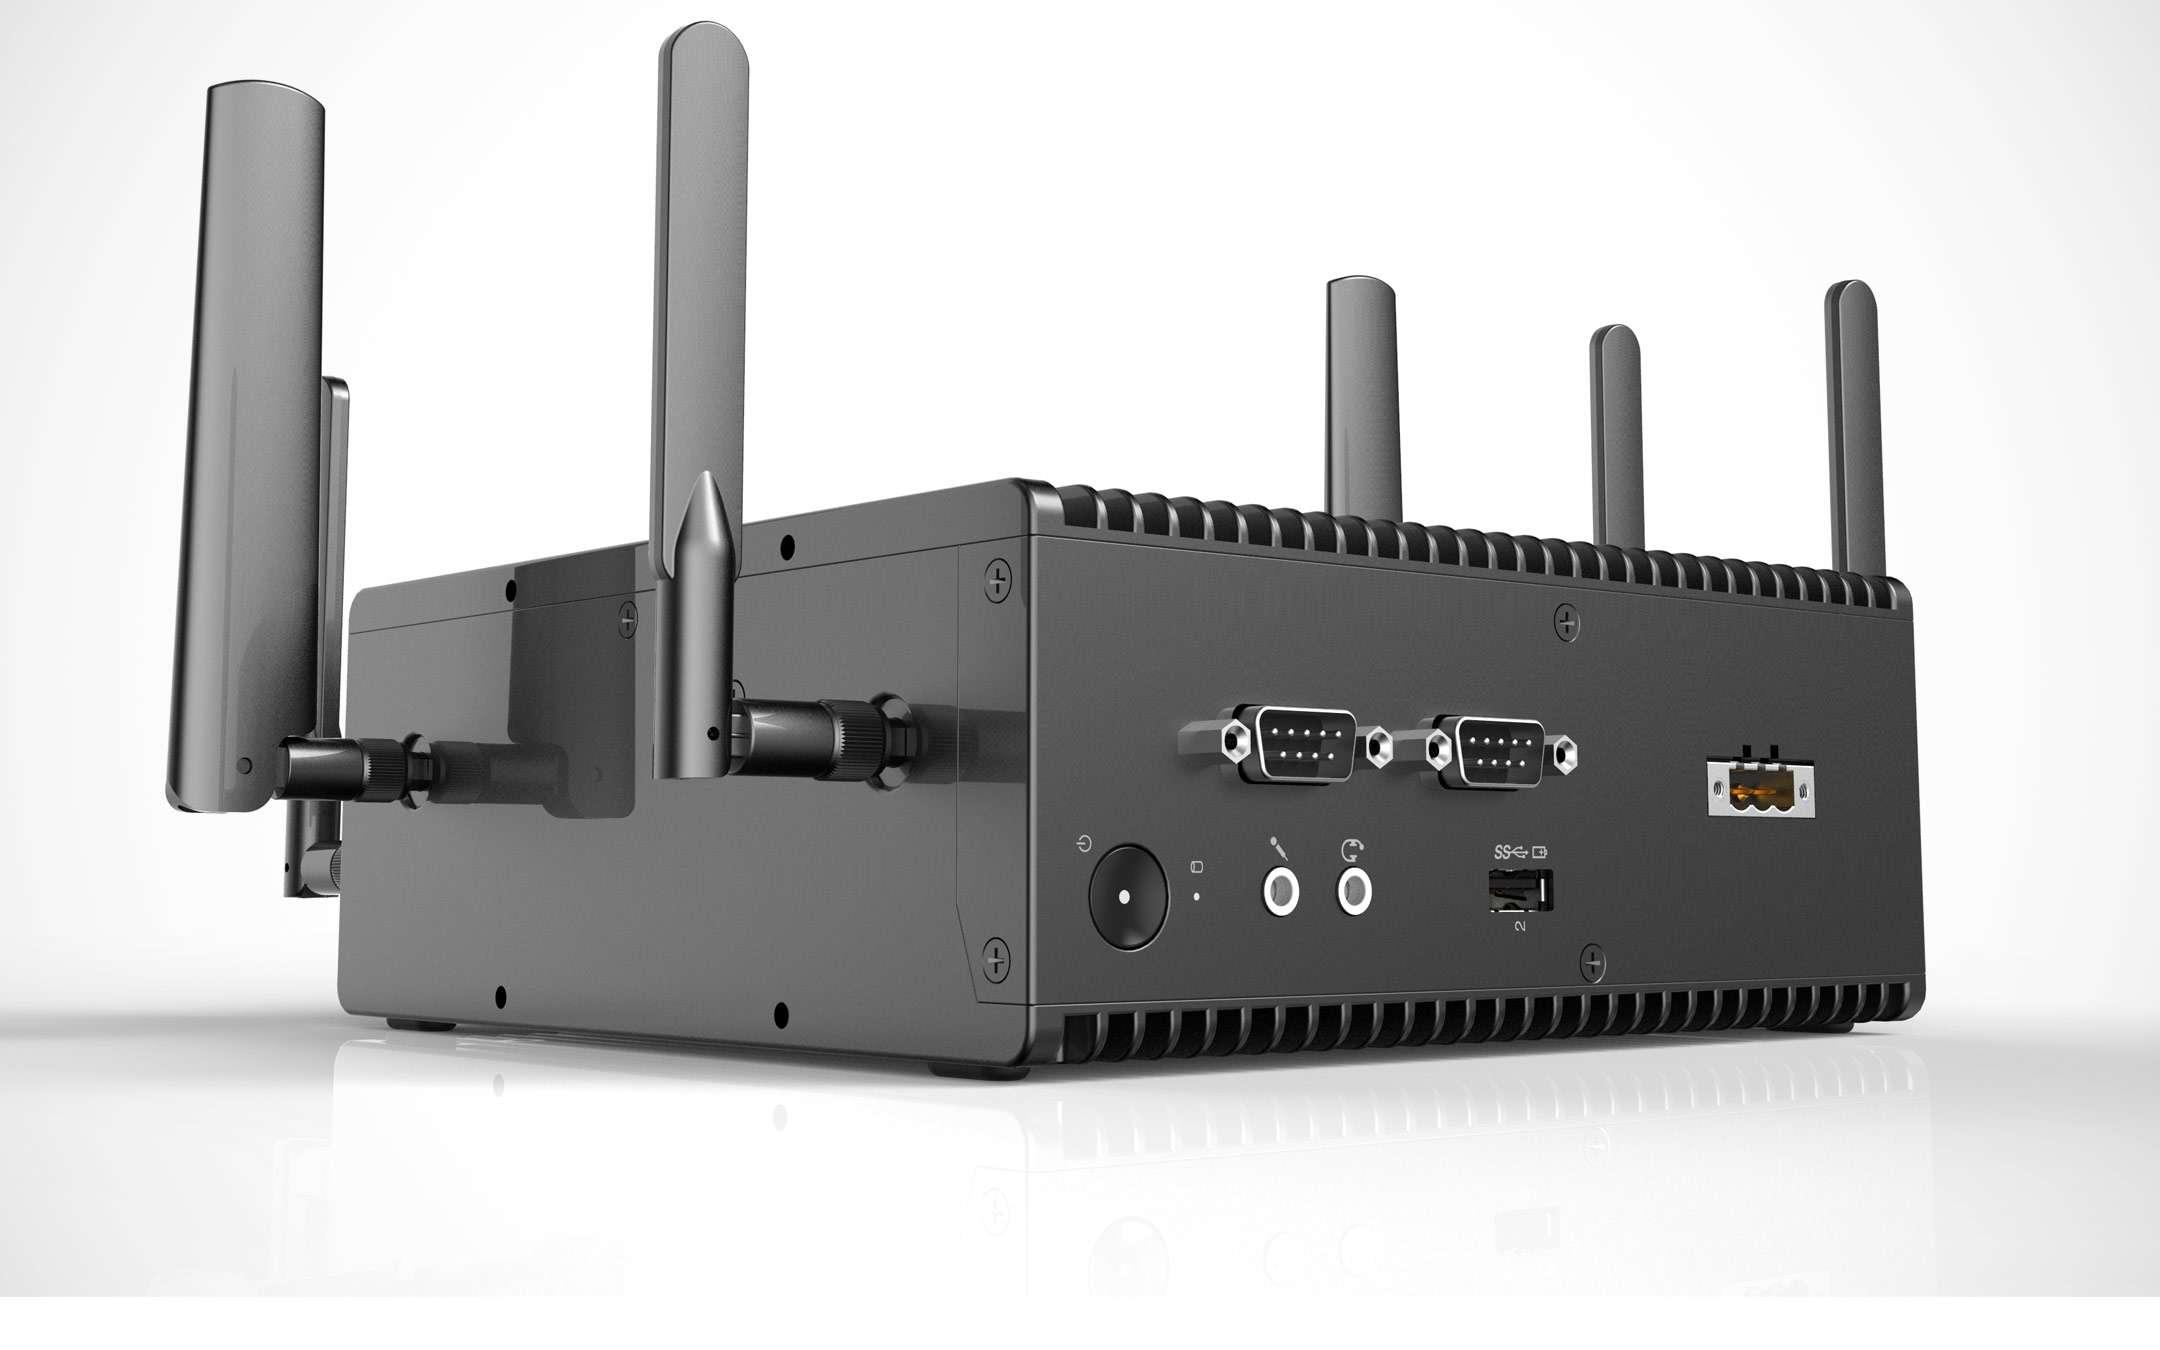 Lenovo ThinkEdge SE30 and SE50 for Edge Computing